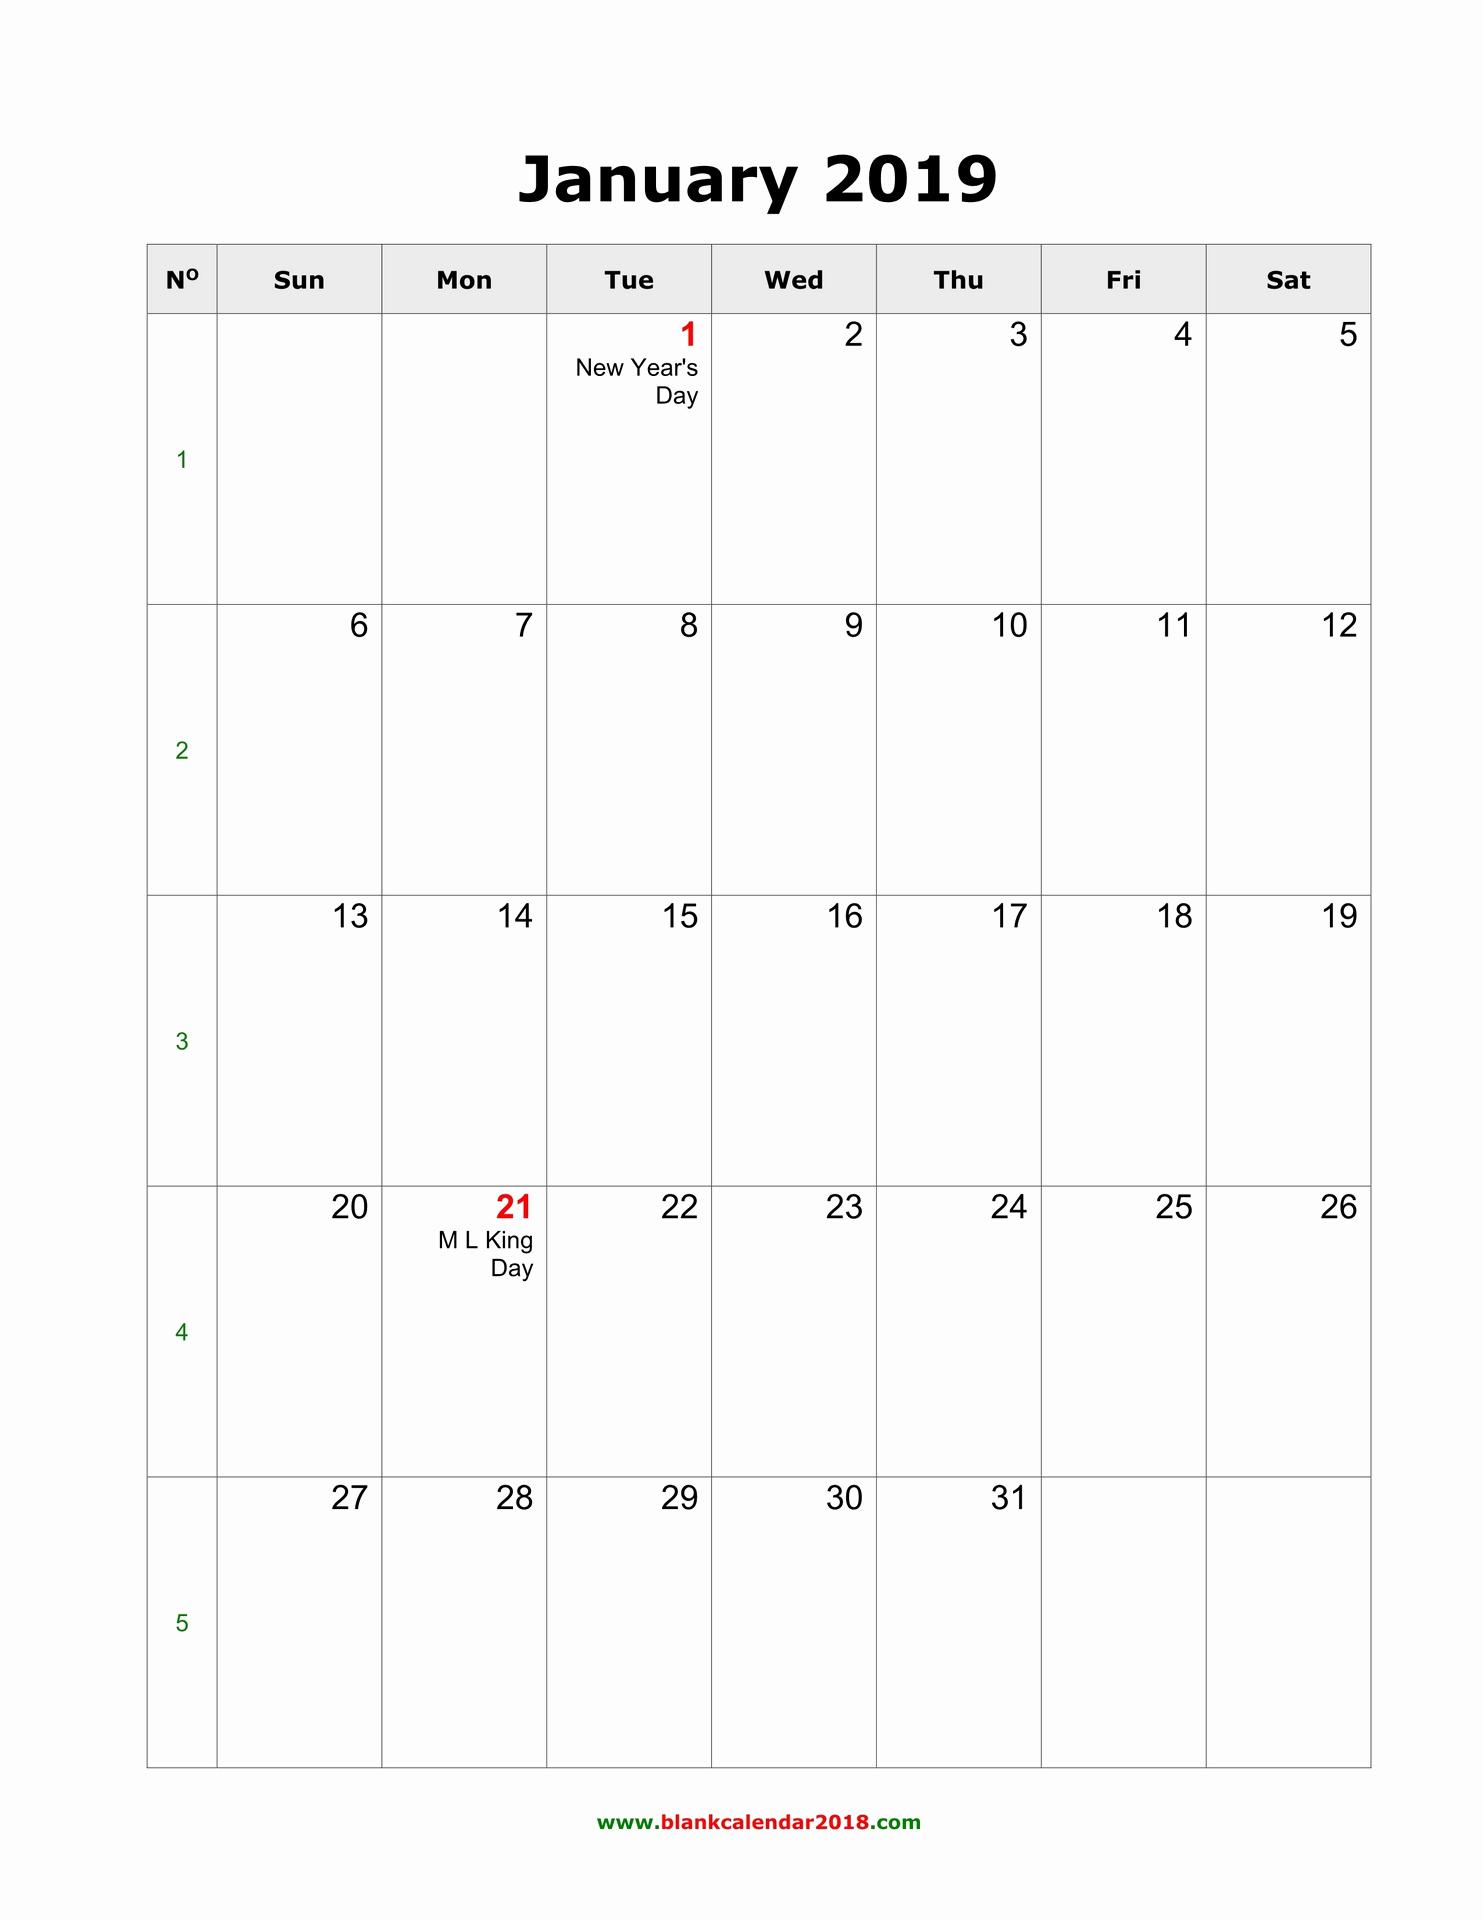 Monthly Calendar Template 2019 Fresh Blank Calendar 2019